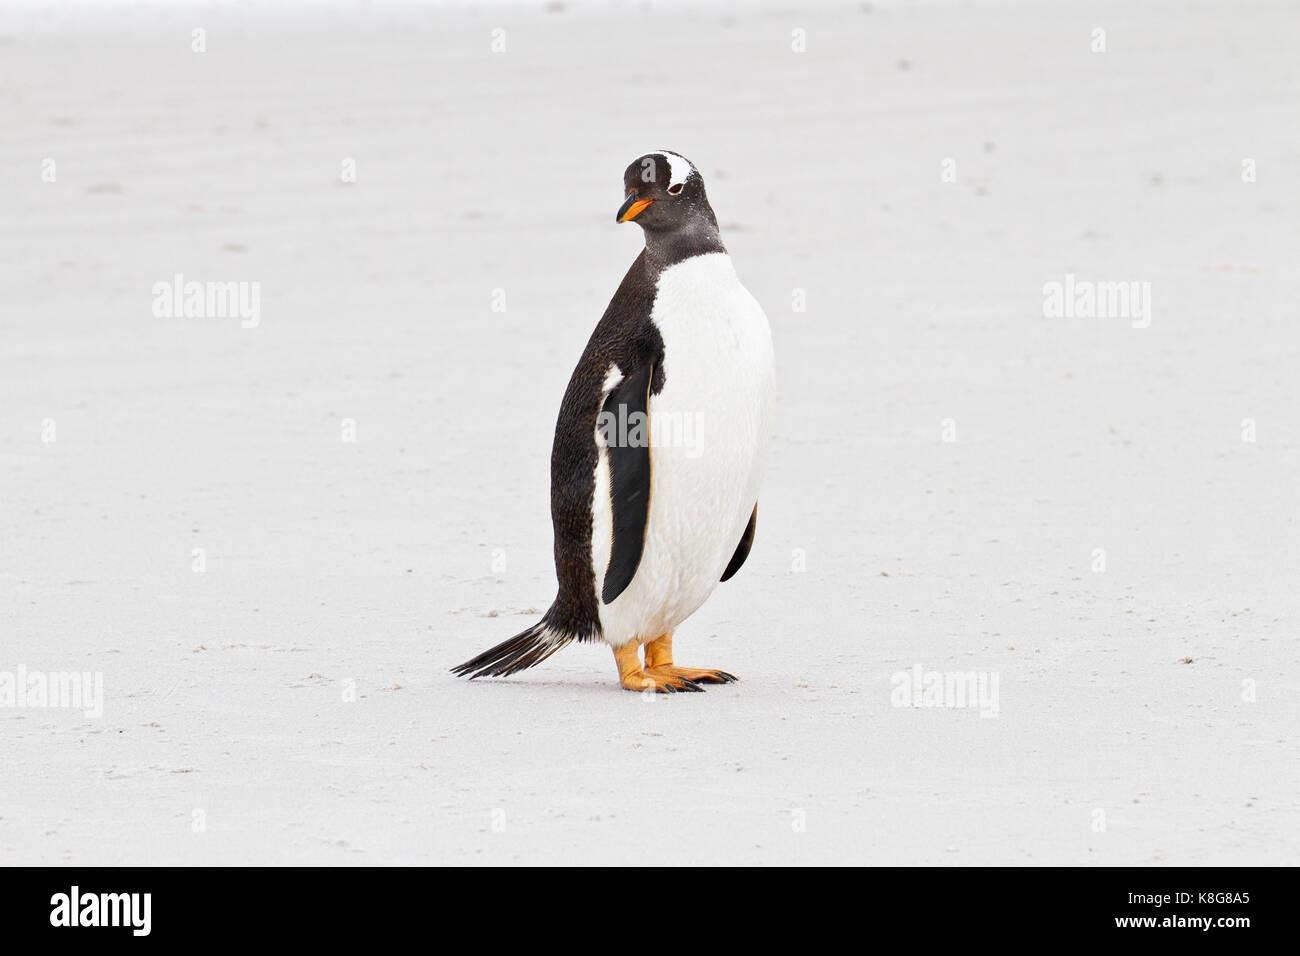 Gentoo penguin, Falkland Islands - Stock Image